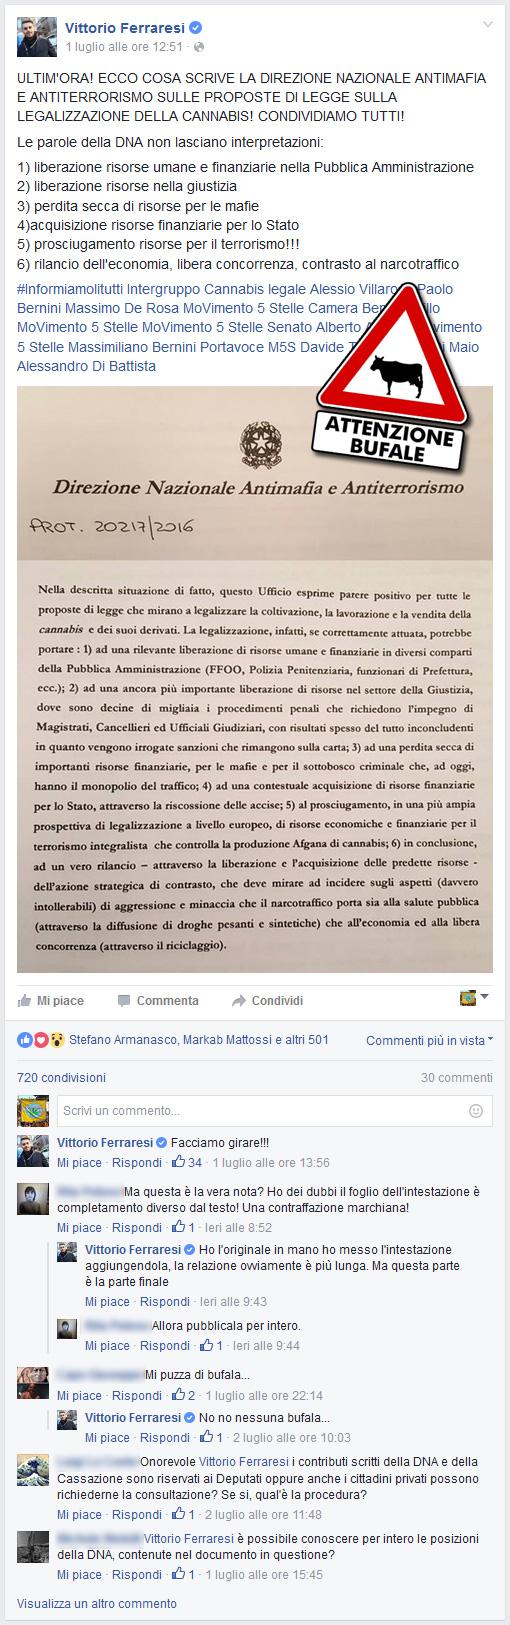 Pagina Facebook Vittorio Ferraresi (M5S) - 1 luglio 2016, ore 12:51